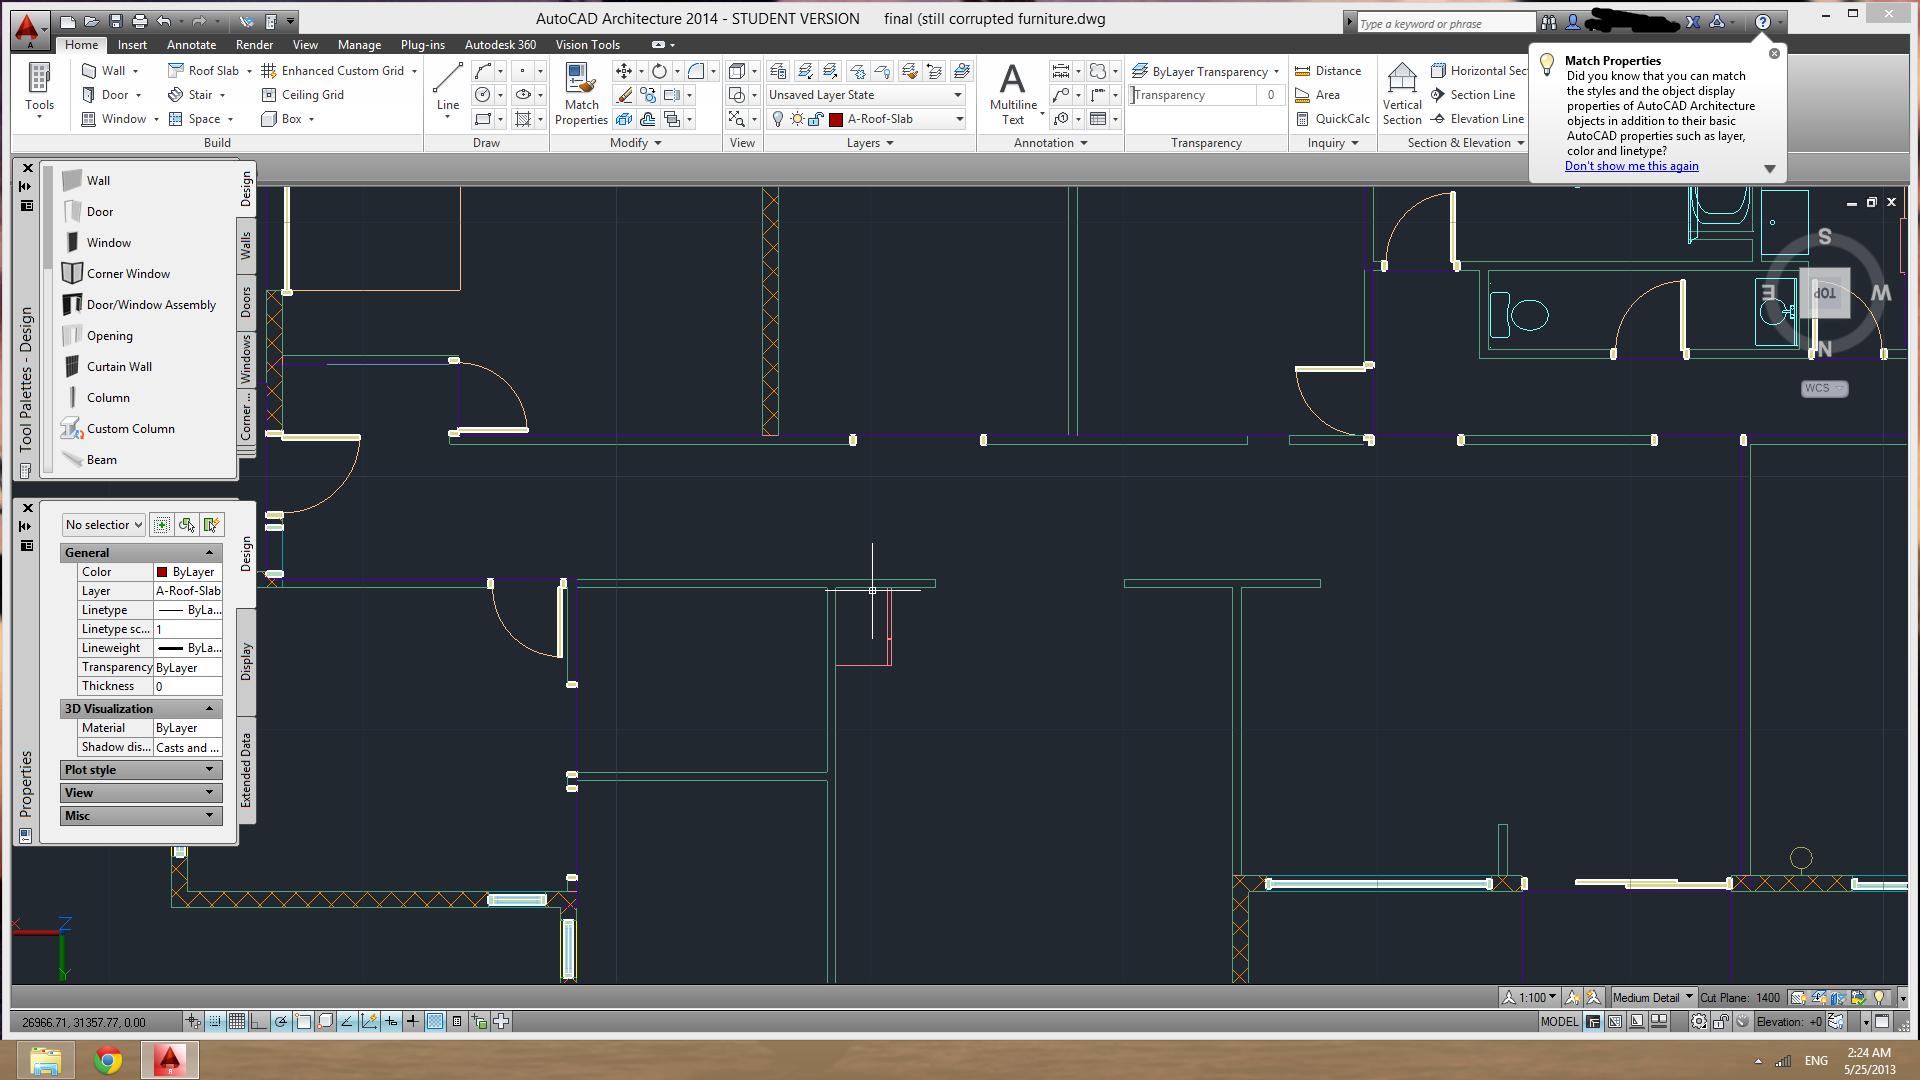 Exceptional Autodesk Forums Home Design Ideas